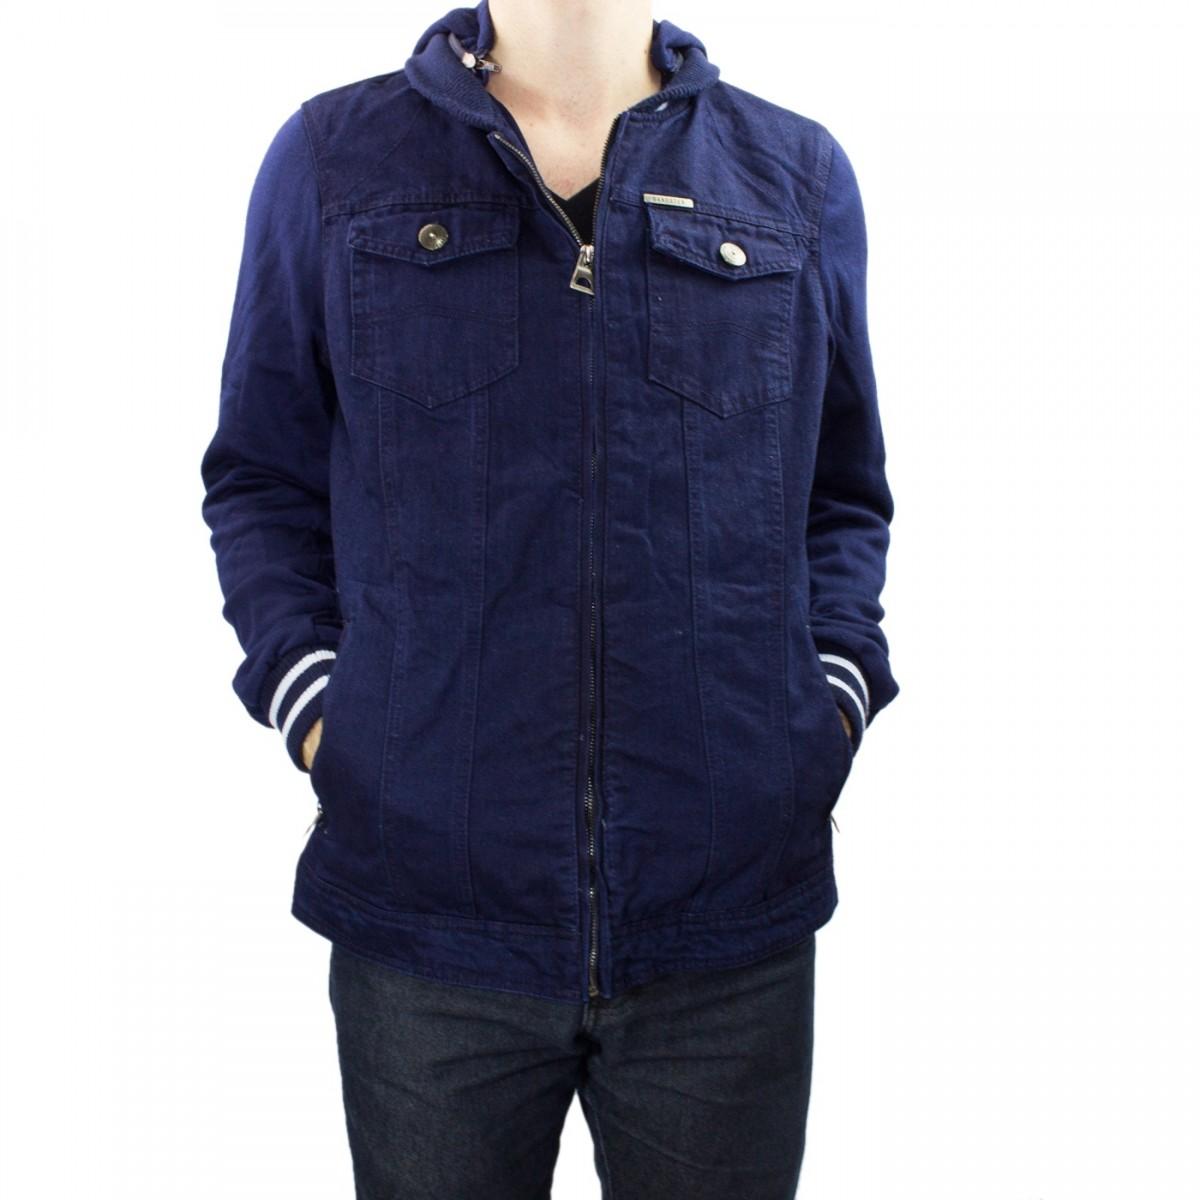 4003415b57 Bizz Store - Jaqueta Masculina Gangster Jeans Moletom Azul